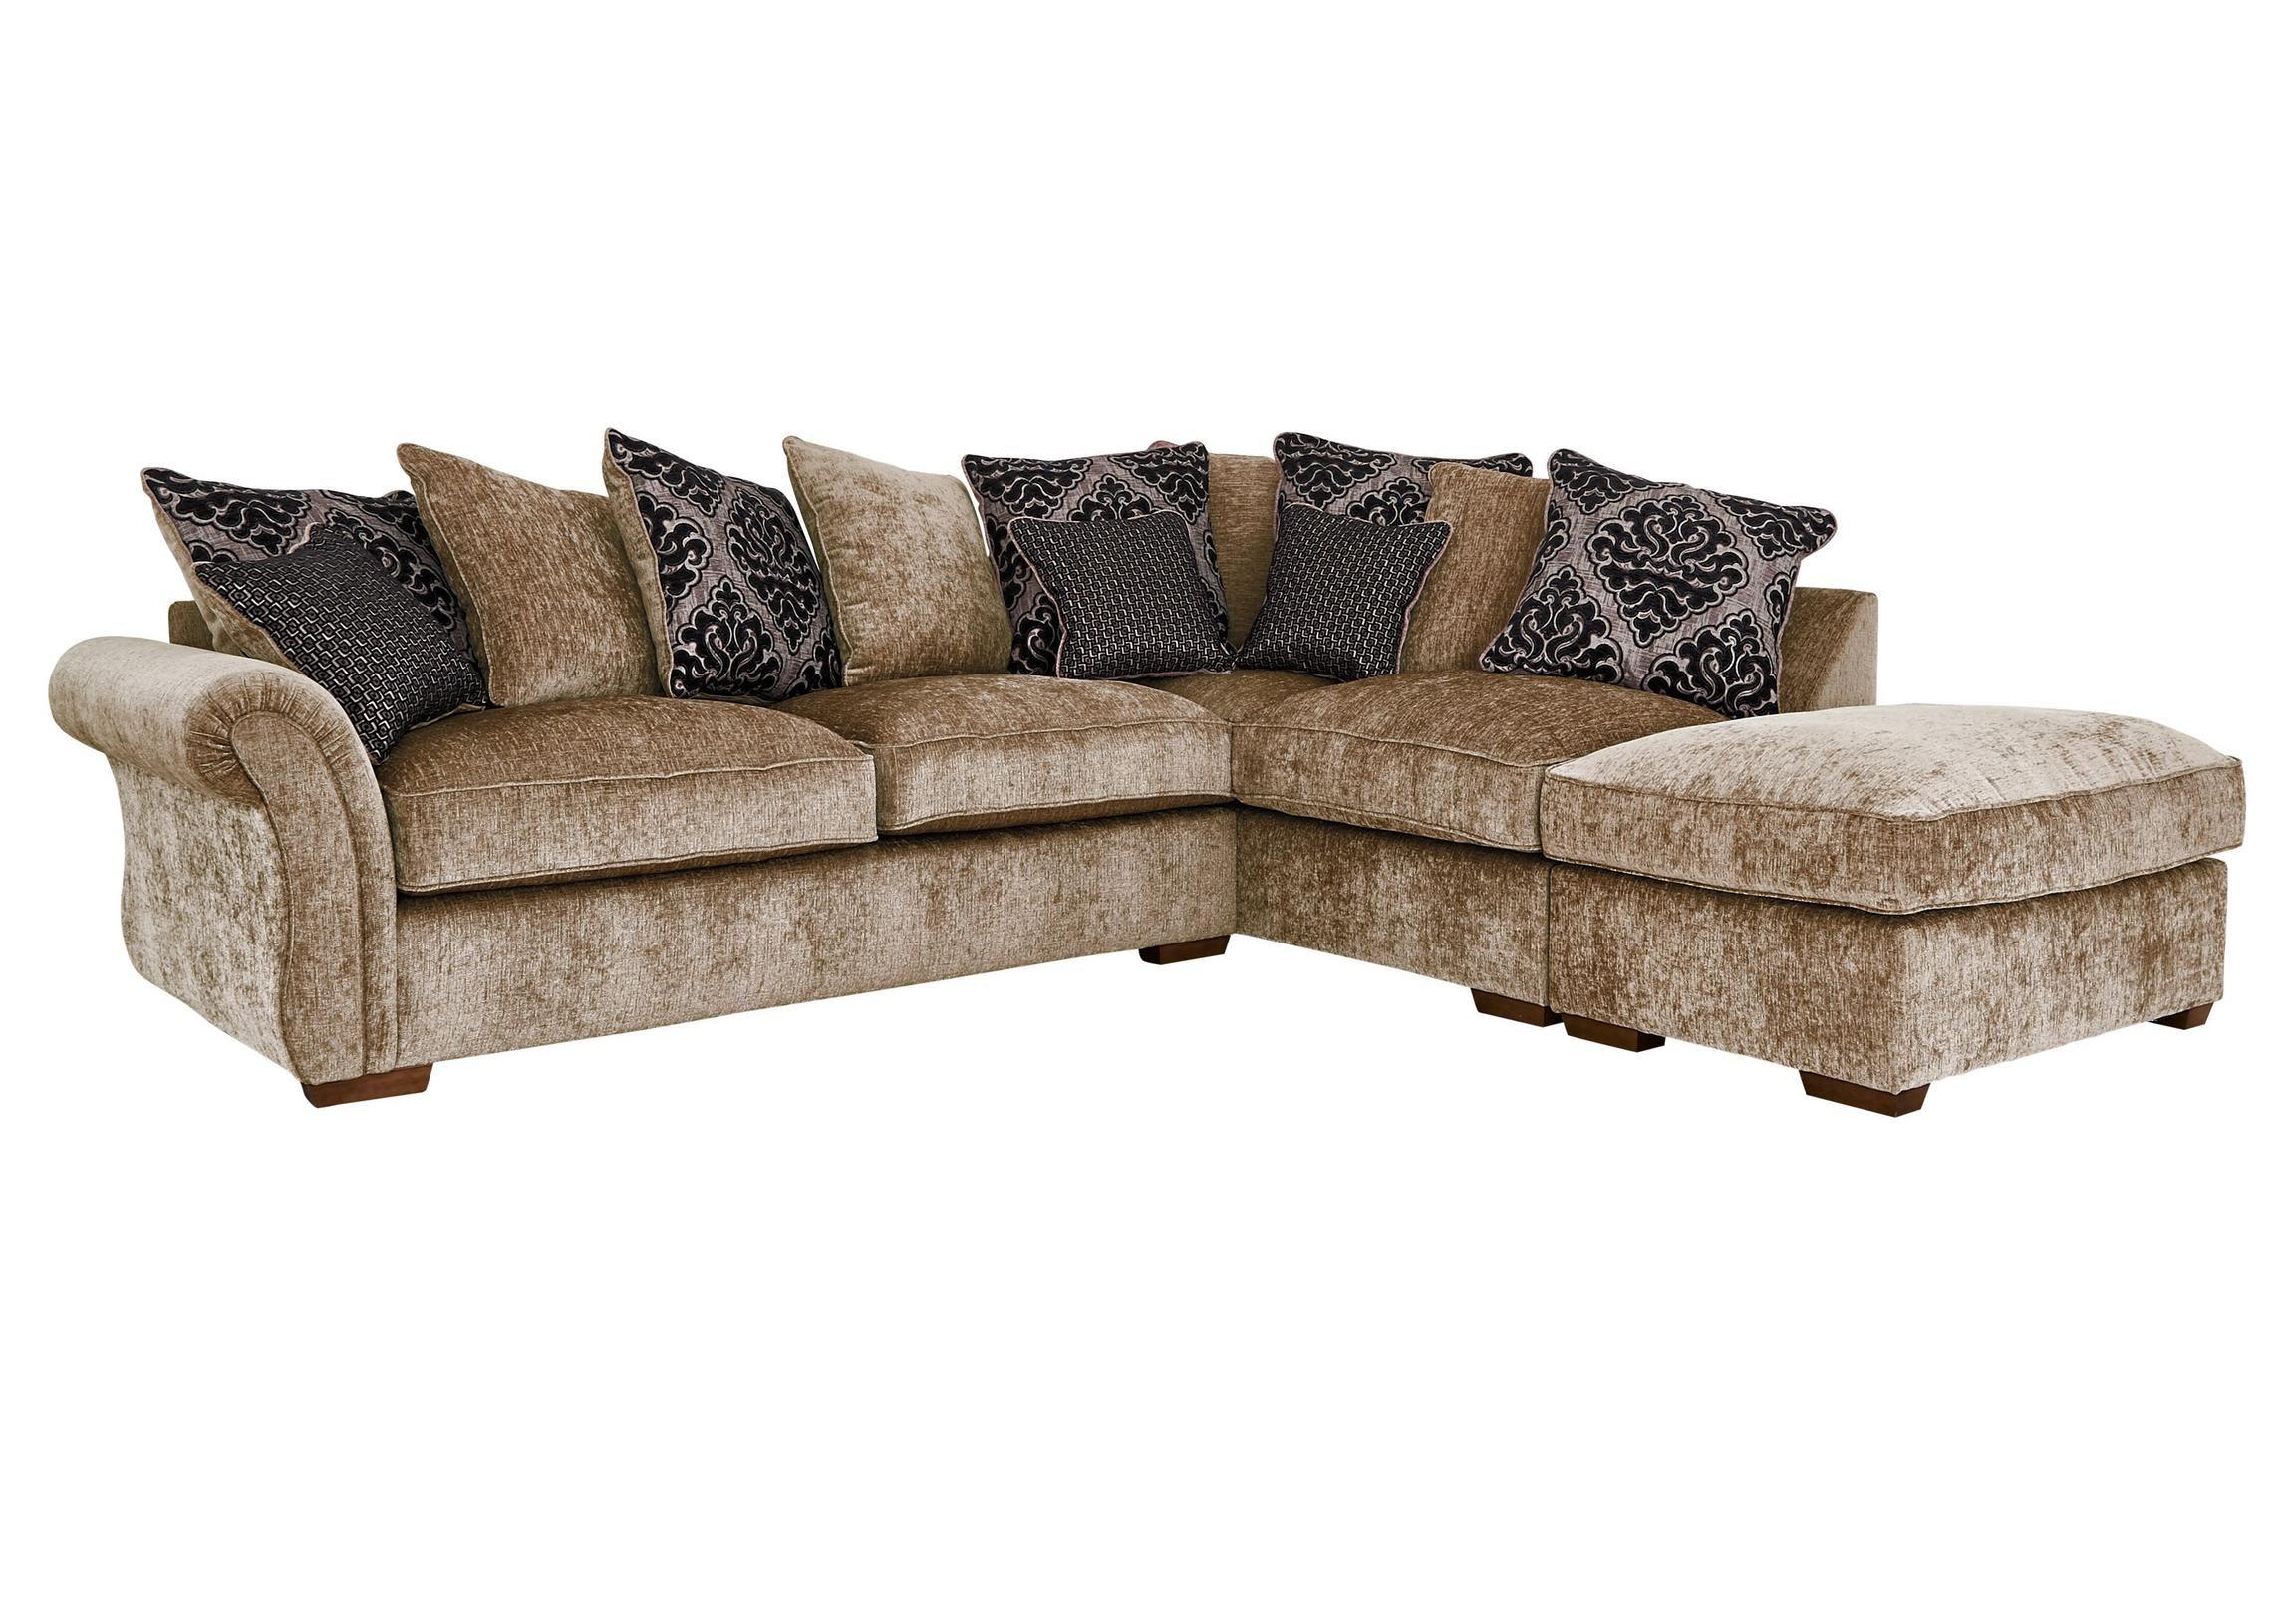 Luxor Fabric Pillow Back Corner Sofa Corner Sofa Living Room Furniture Sofas Furniture Village